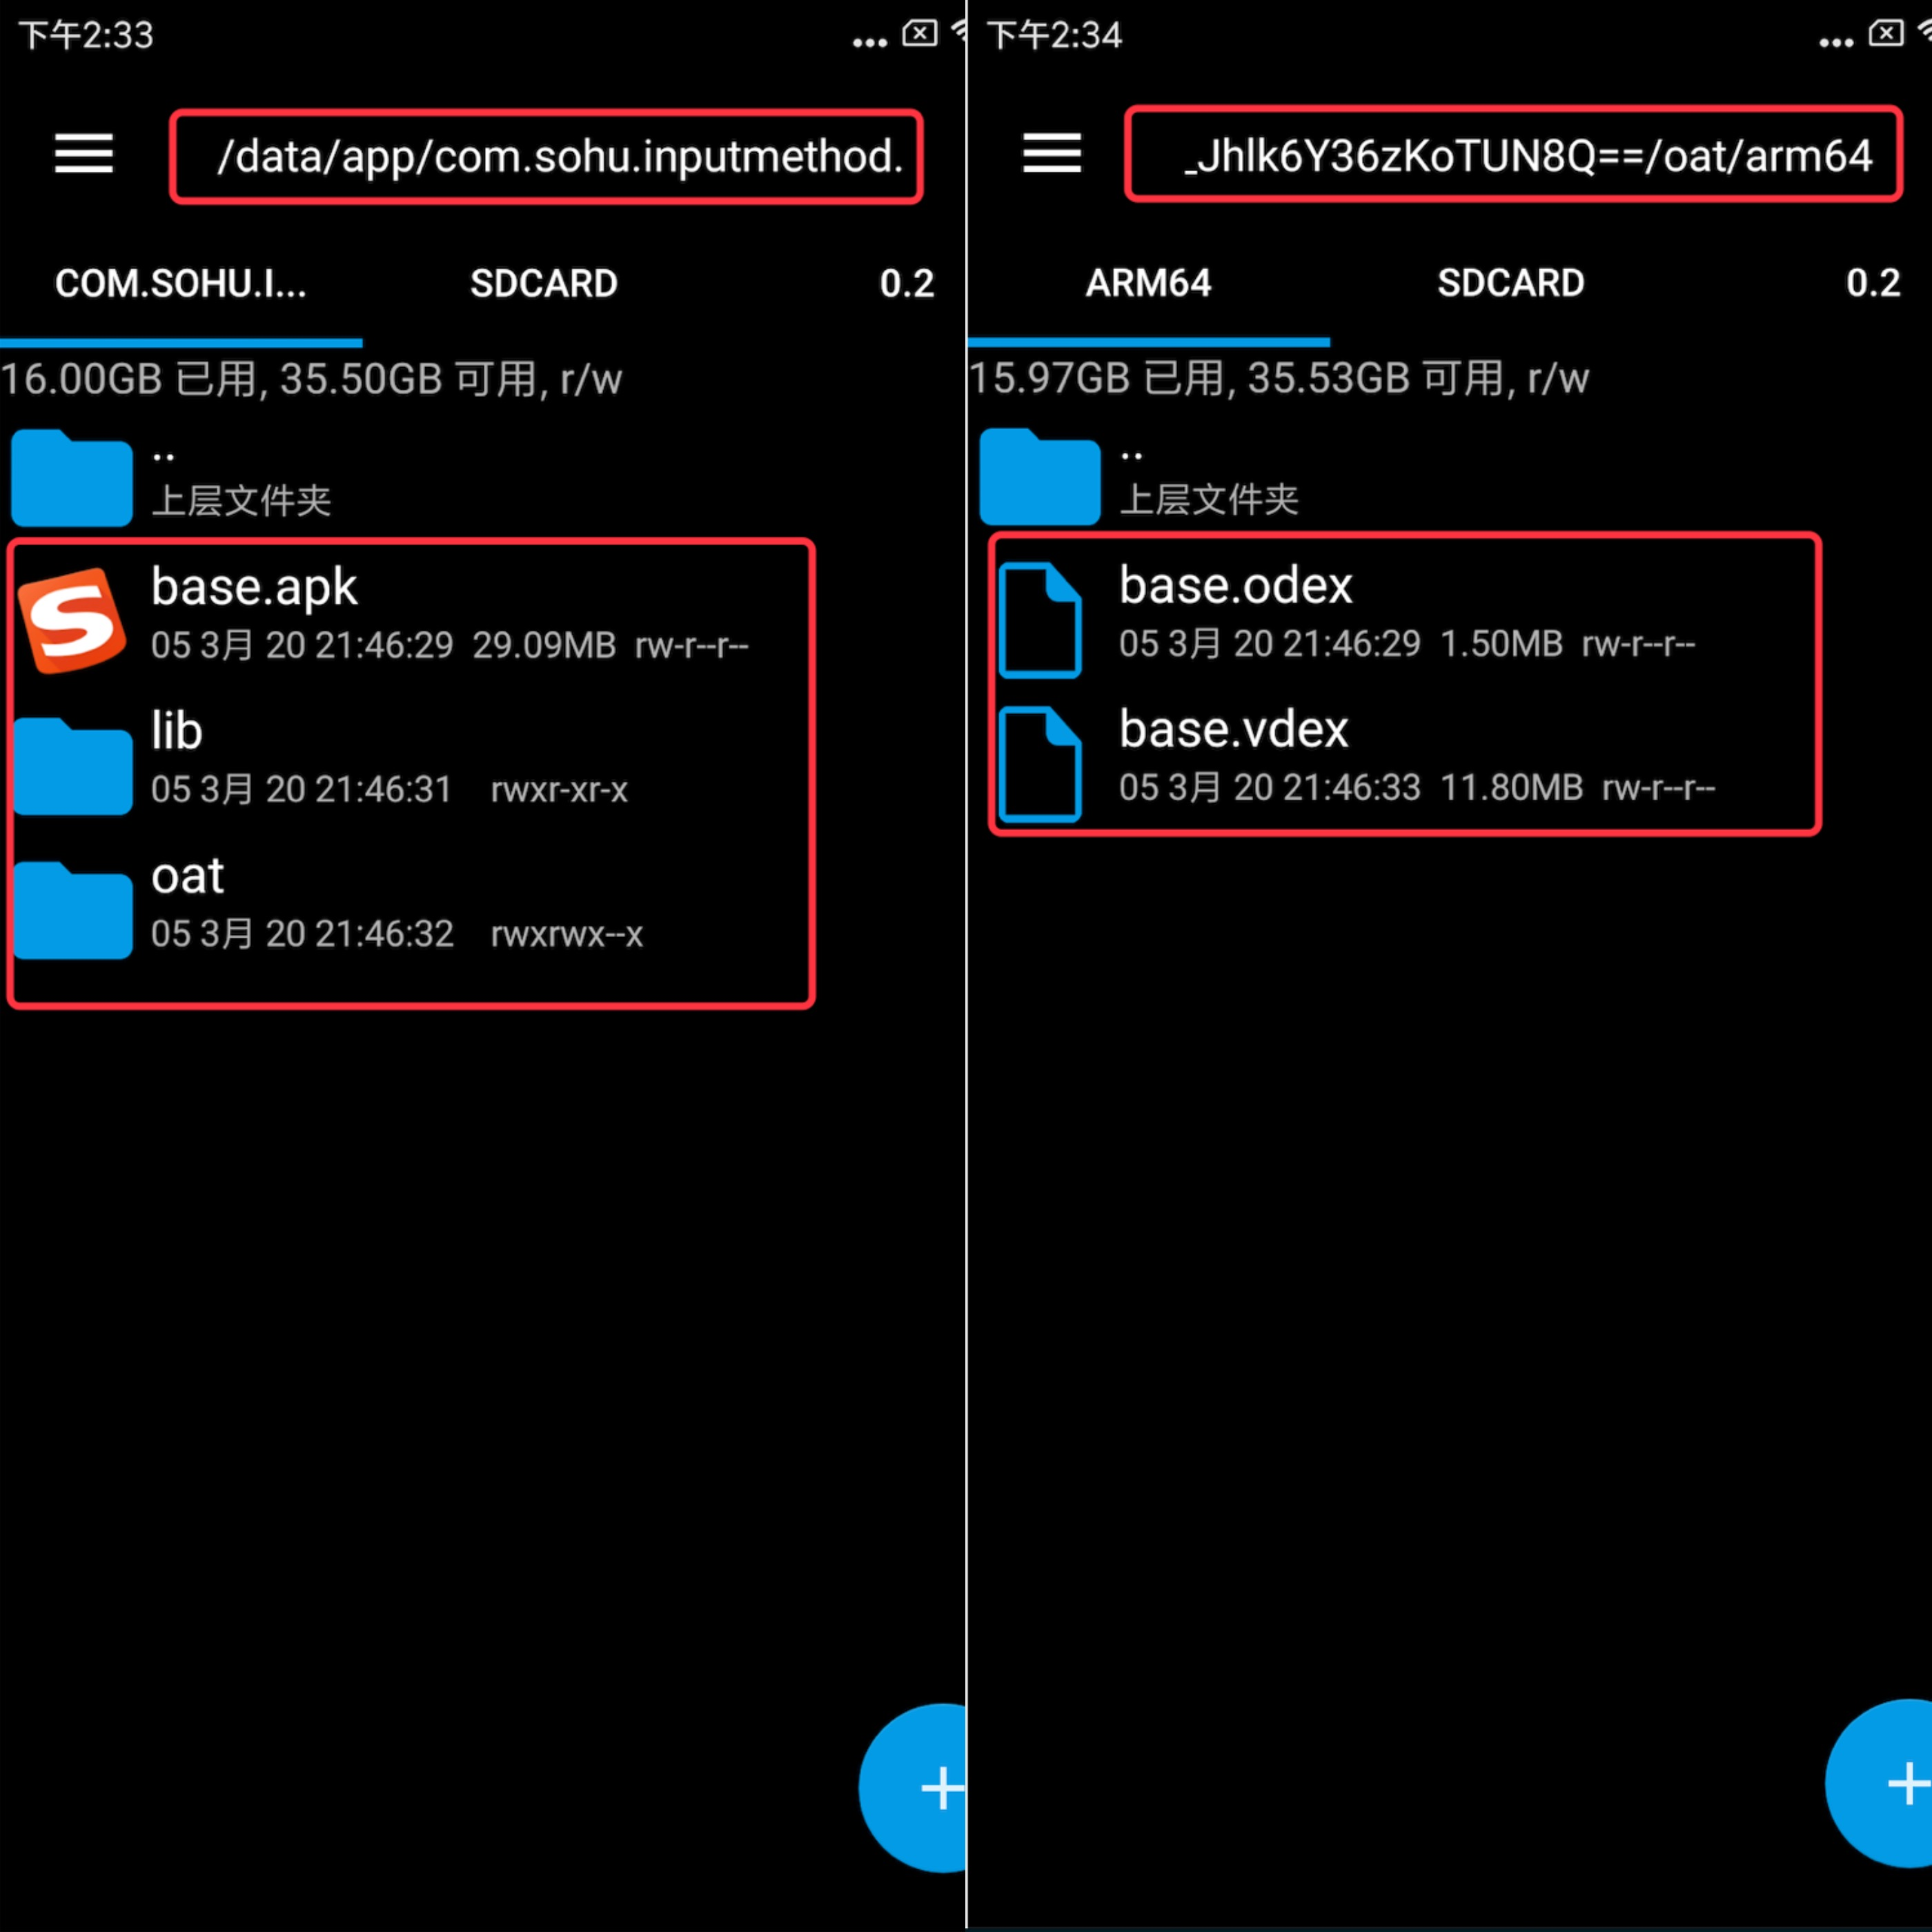 sogou-data-app-xxxxx.jpg